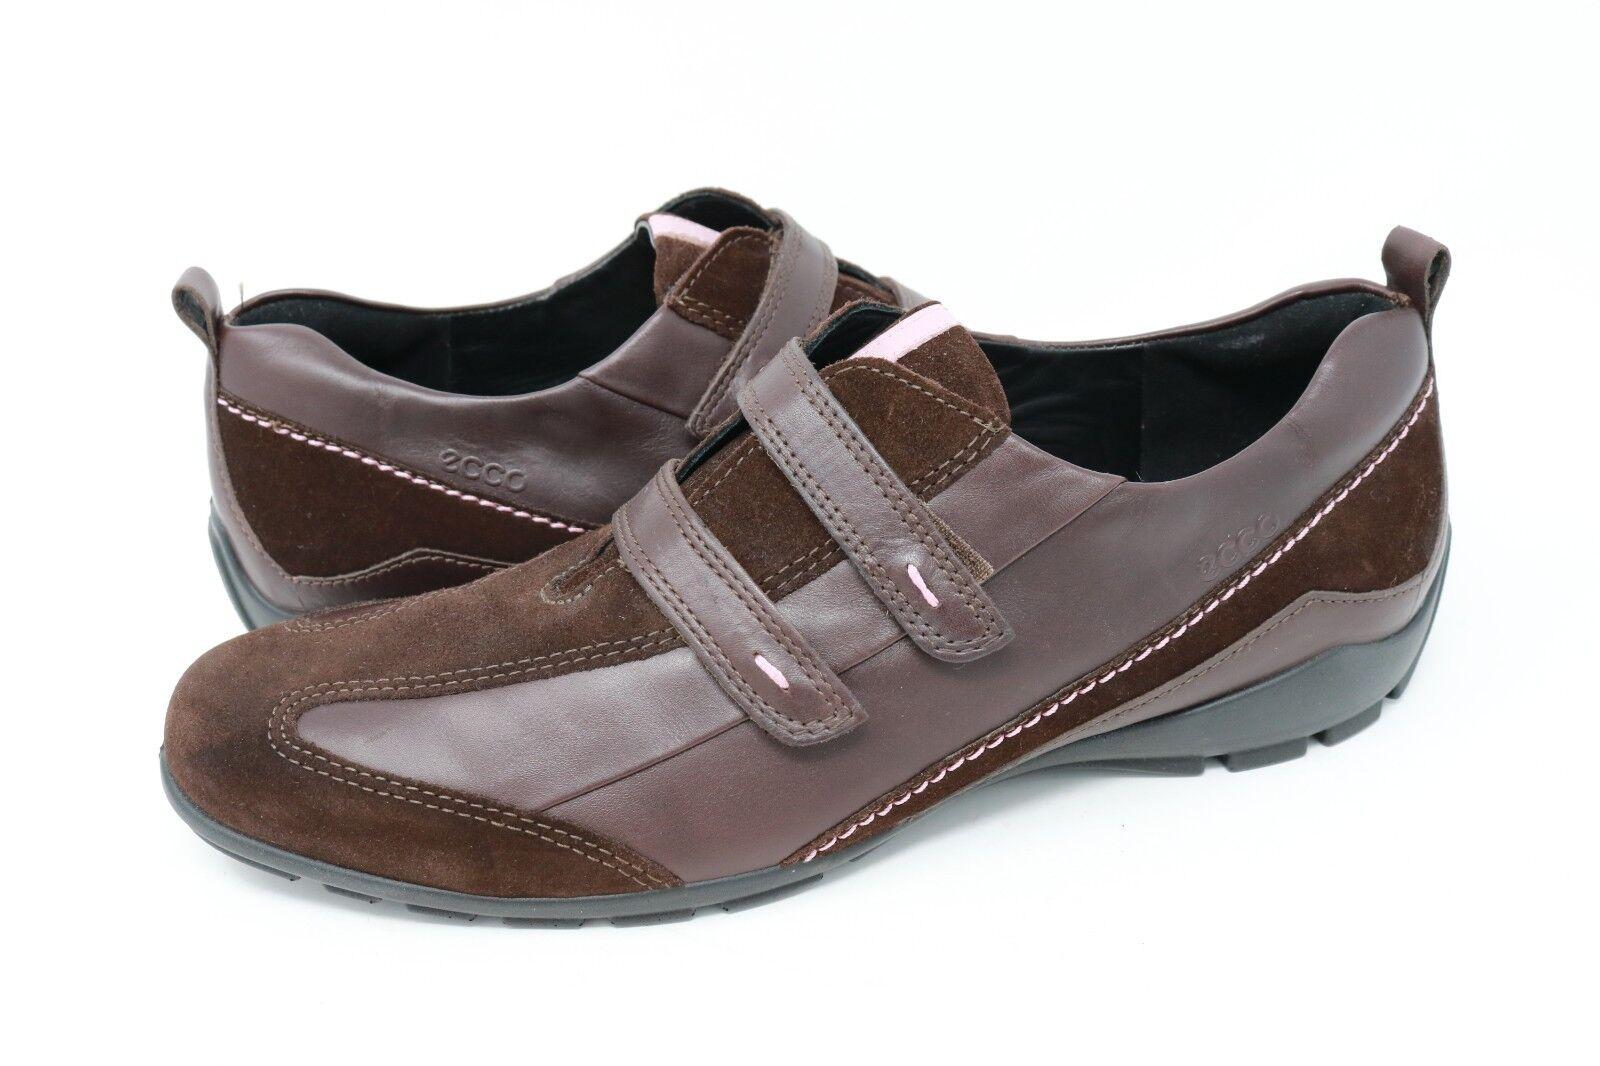 Ecco damen braun braun braun Leather Walking schuhe Comfort Hook And Loop Größe 40   9 b950dc